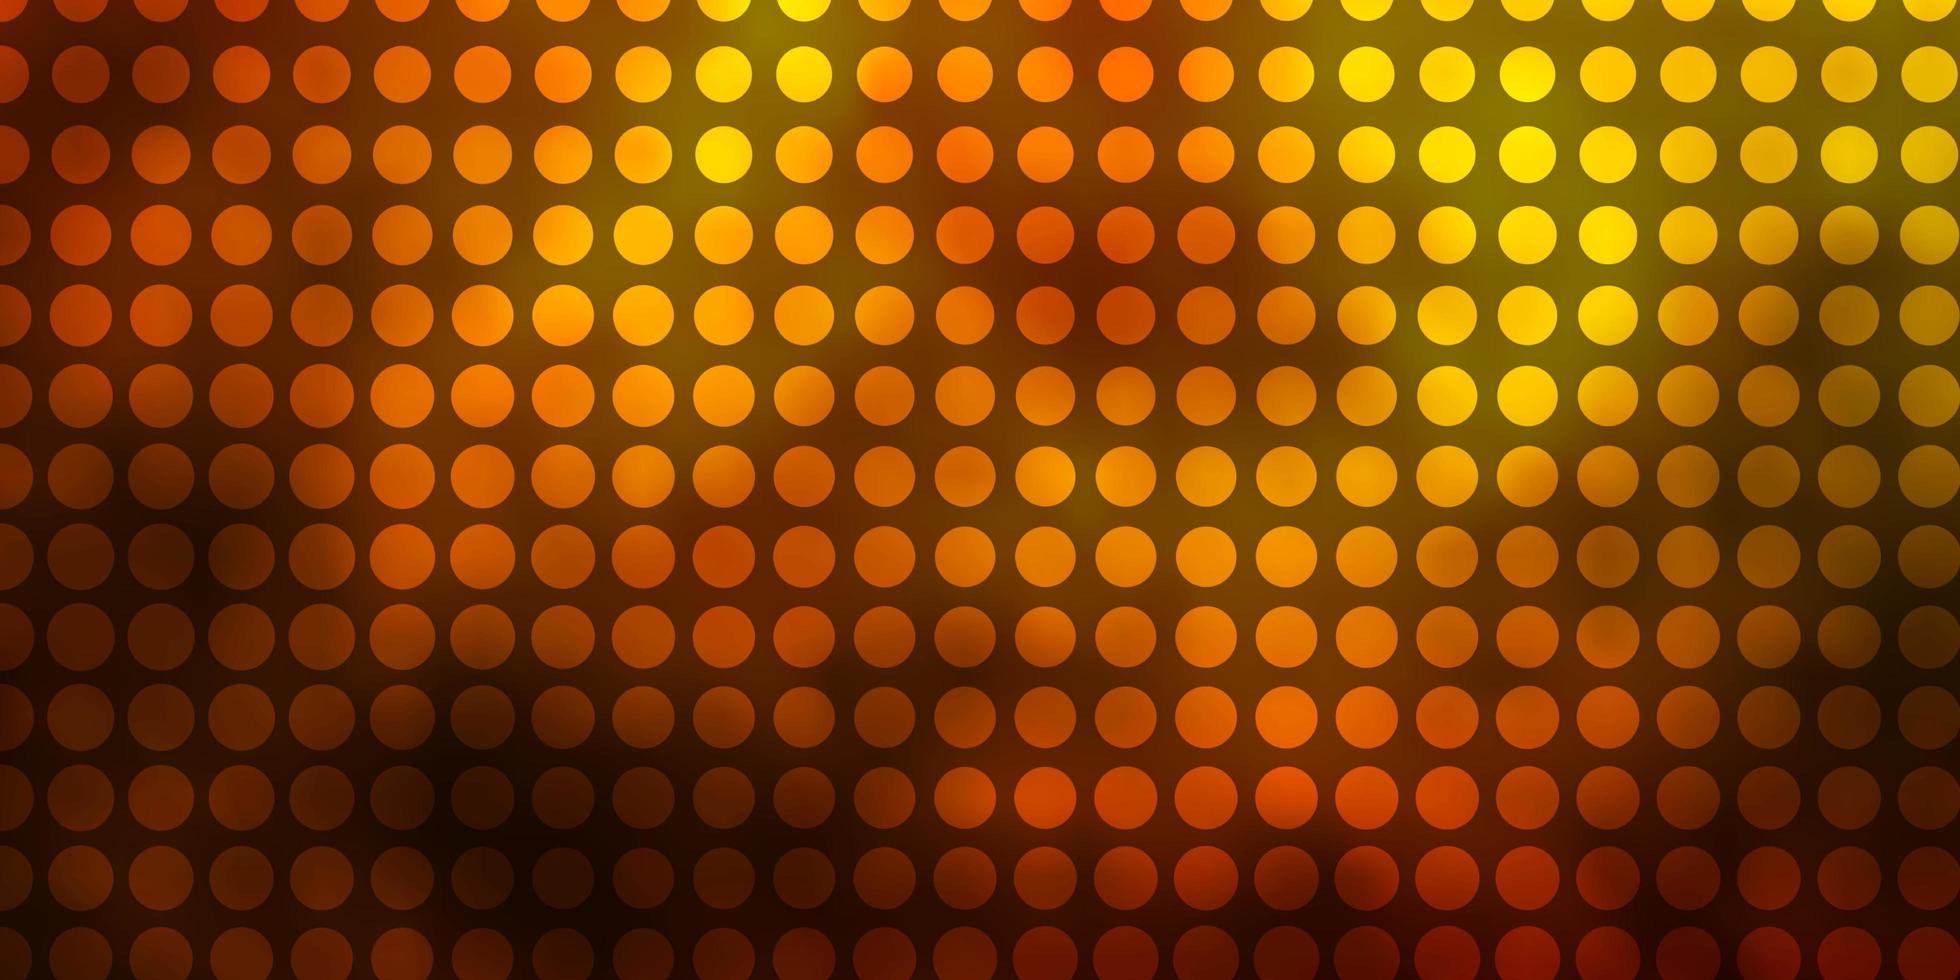 dunkelgrüne, gelbe Vektorschablone mit Kreisen. vektor